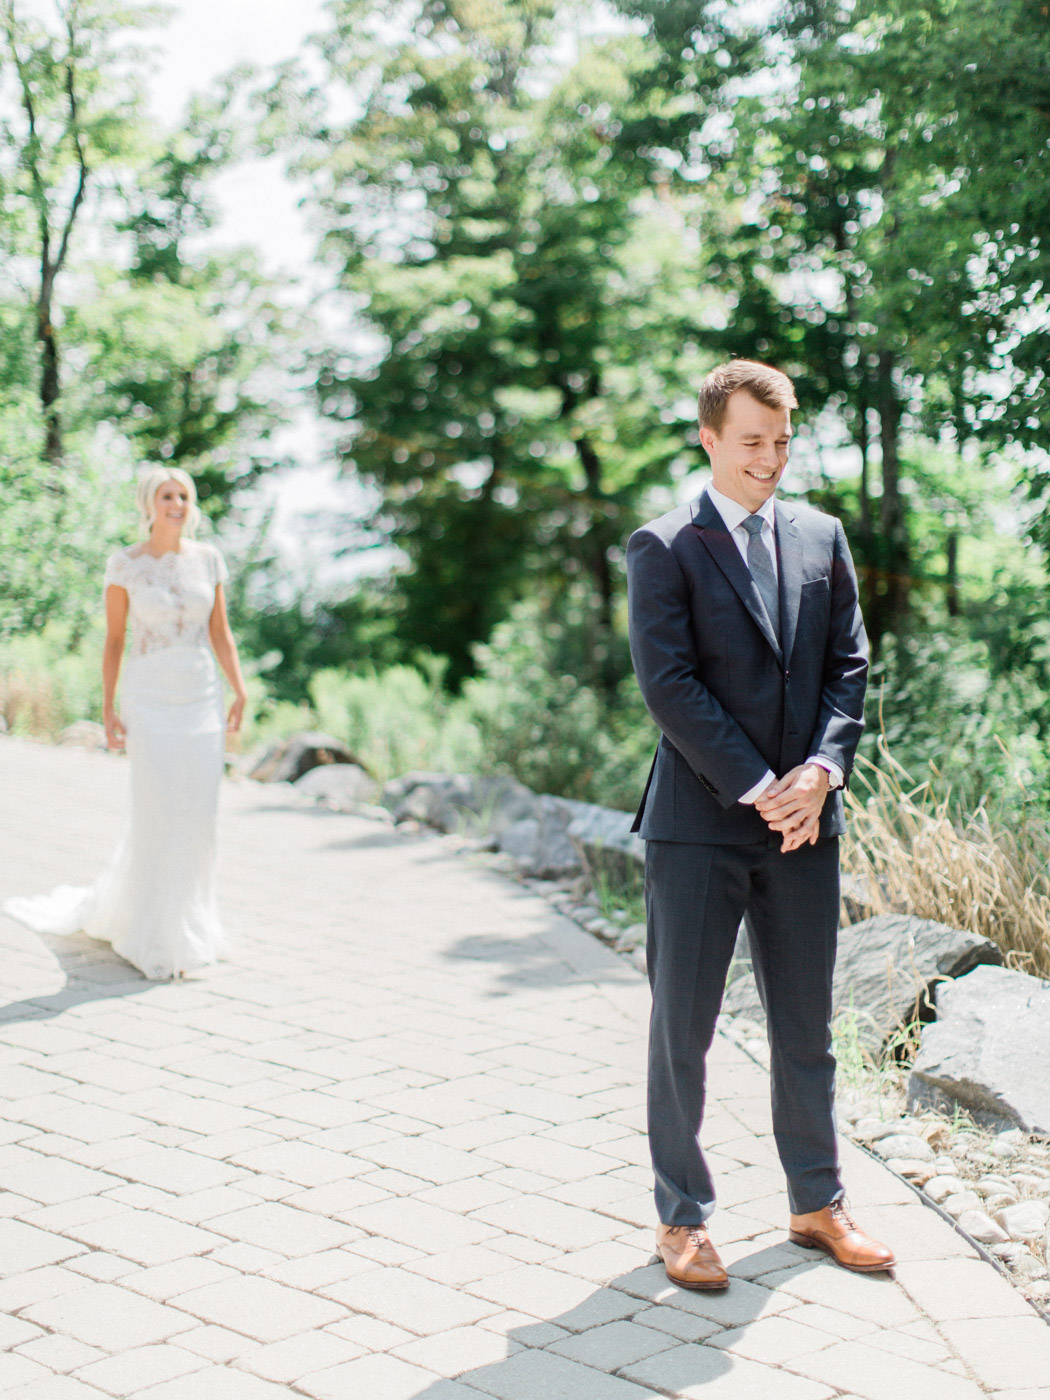 Toronto-Muskoka-wedding-photographer-summery-fun-documentary-the-marriott-rosseau30.jpg